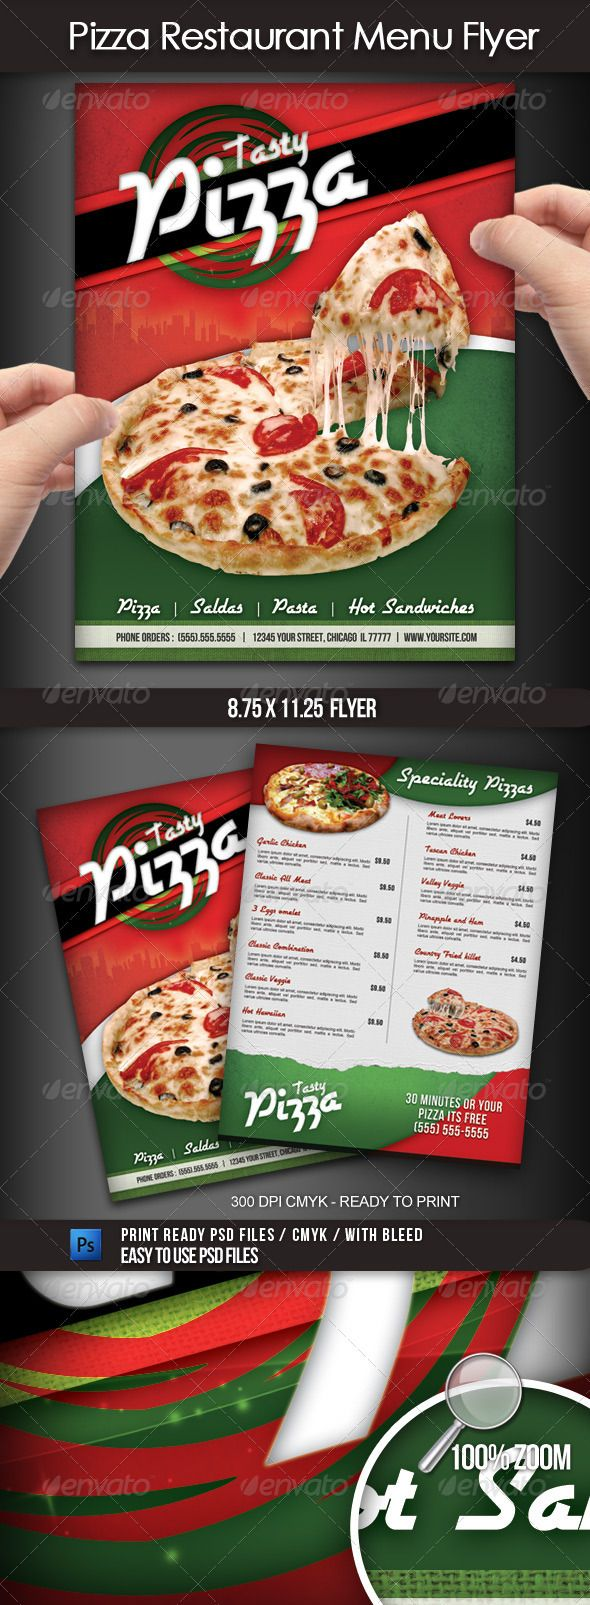 Pizza Restaurant Menu Flyer | Pinterest | Menus restaurantes ...